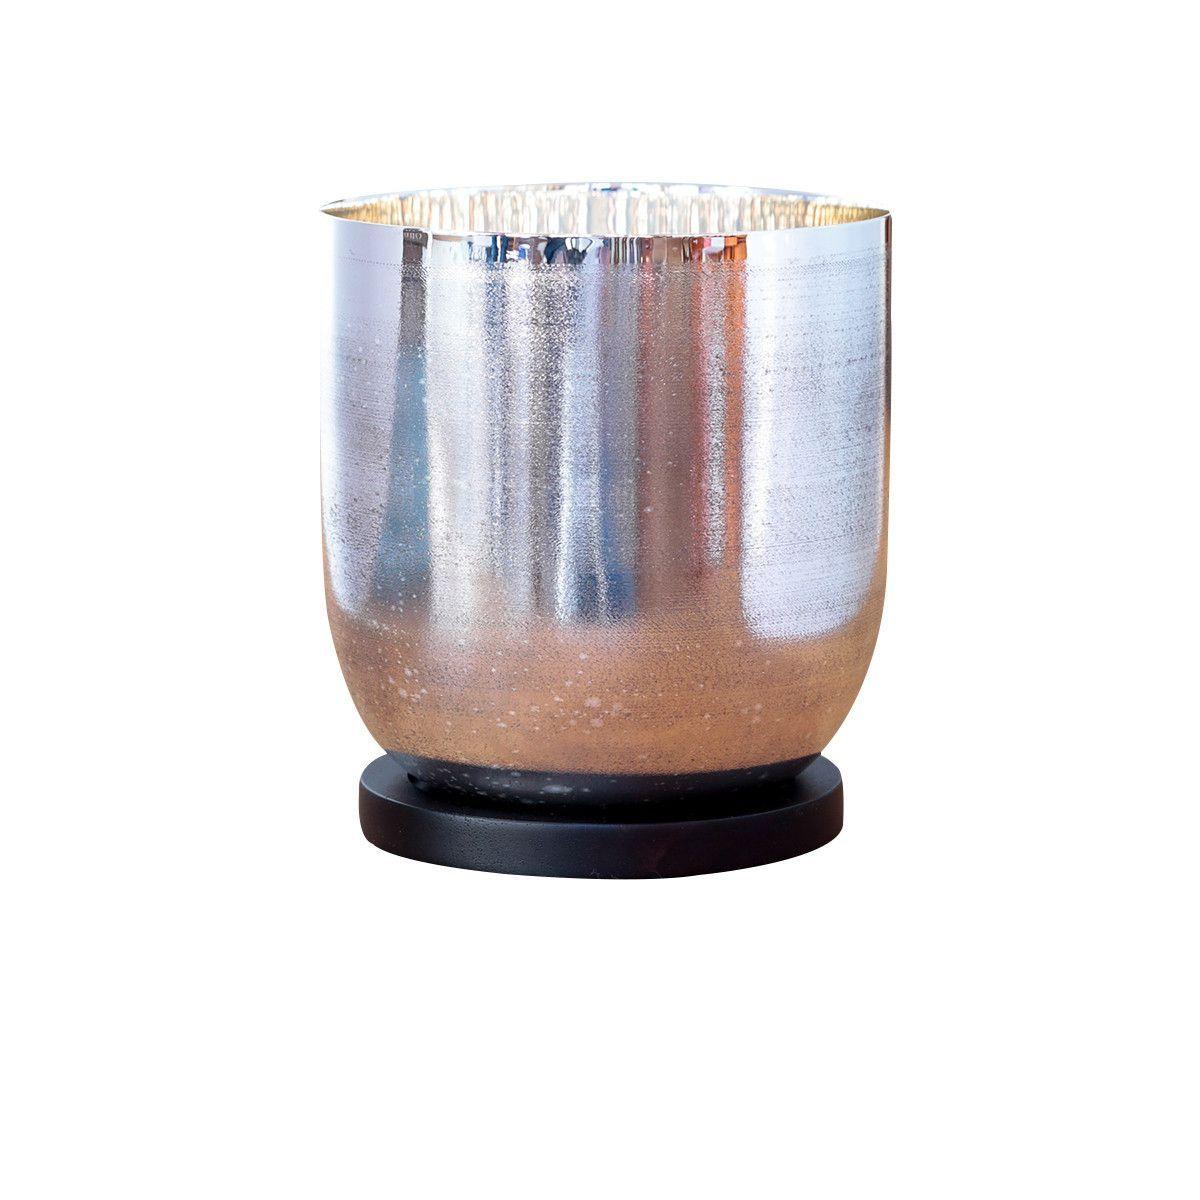 Jacaranda Ice Bucket by Puiforcat